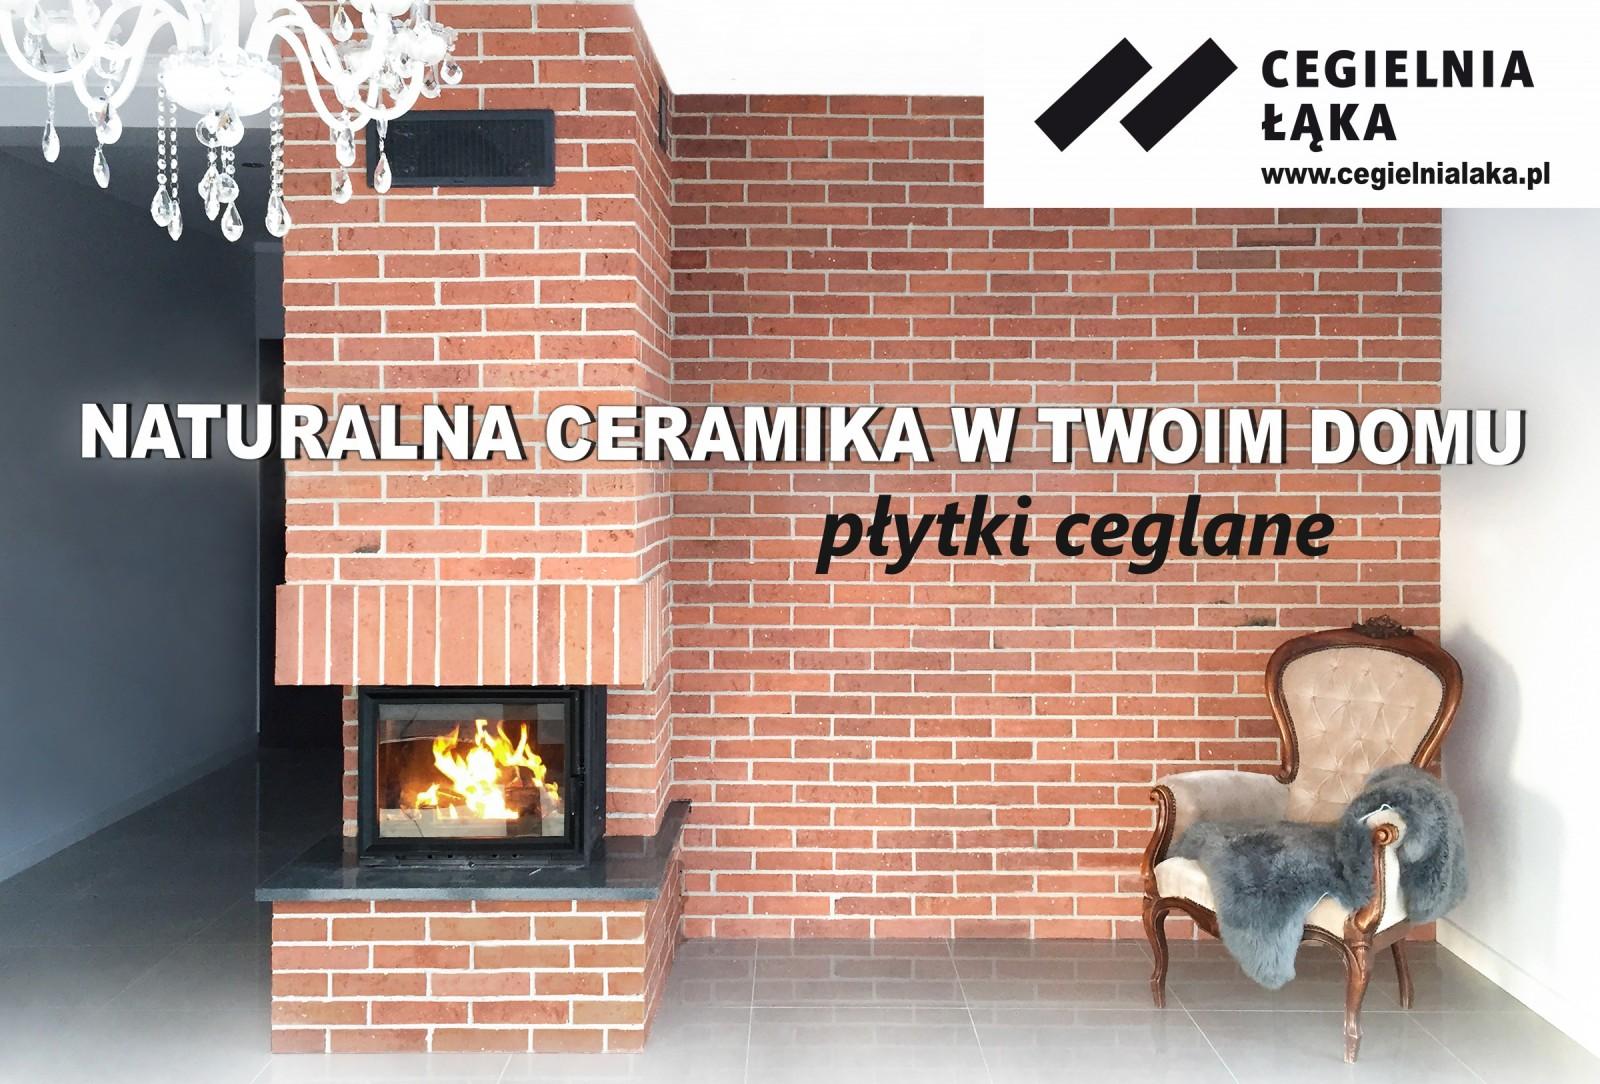 Czecho Pl Cegielnia Laka Naturalne Plytki Ceglane Prosto Od